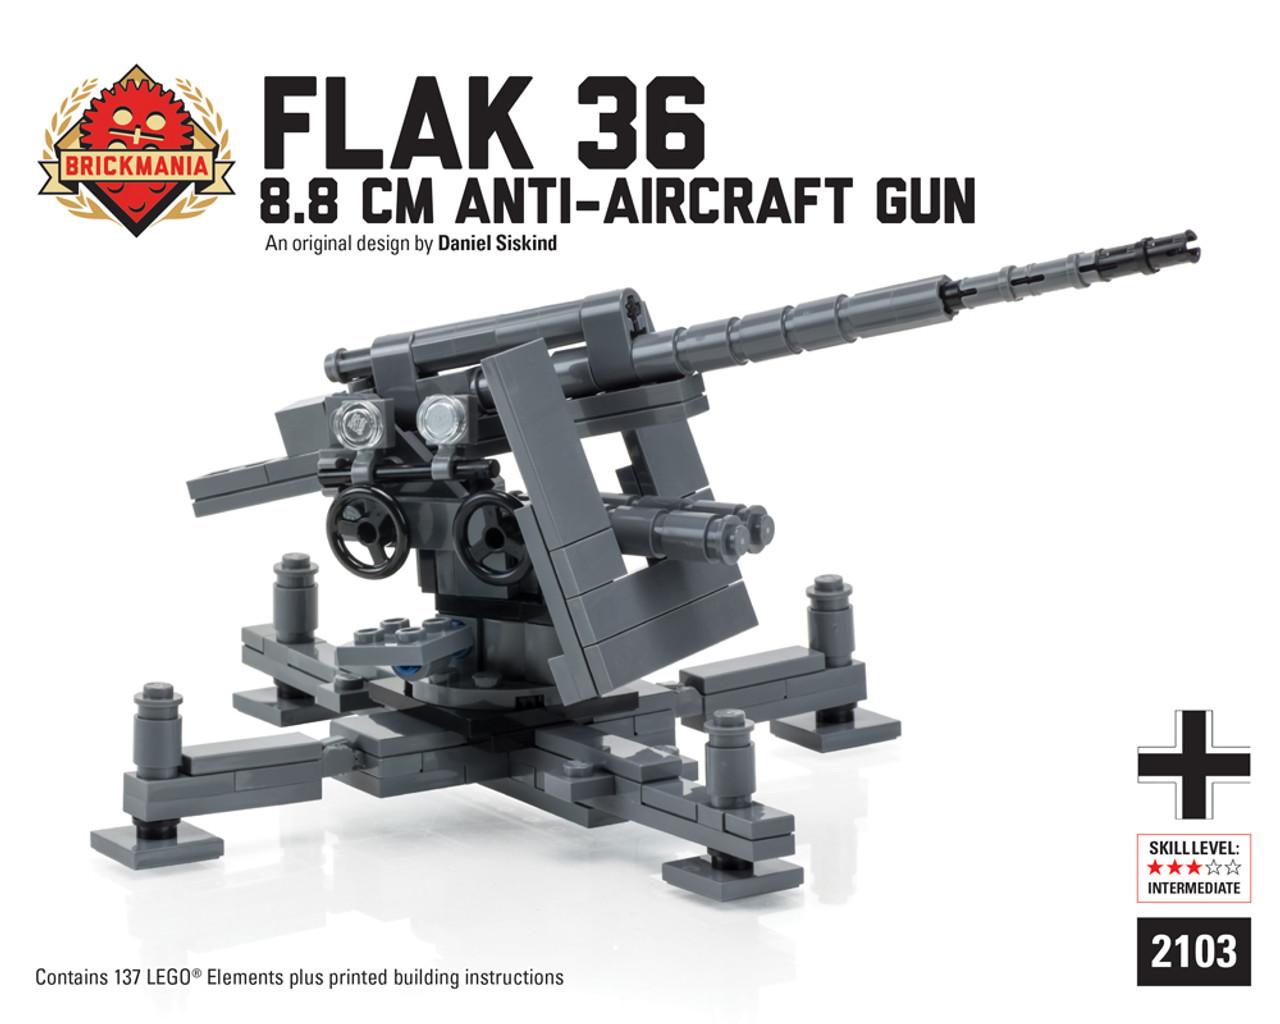 Flak 36 88 Cm Anti Aircraft Gun Brickmania Toys